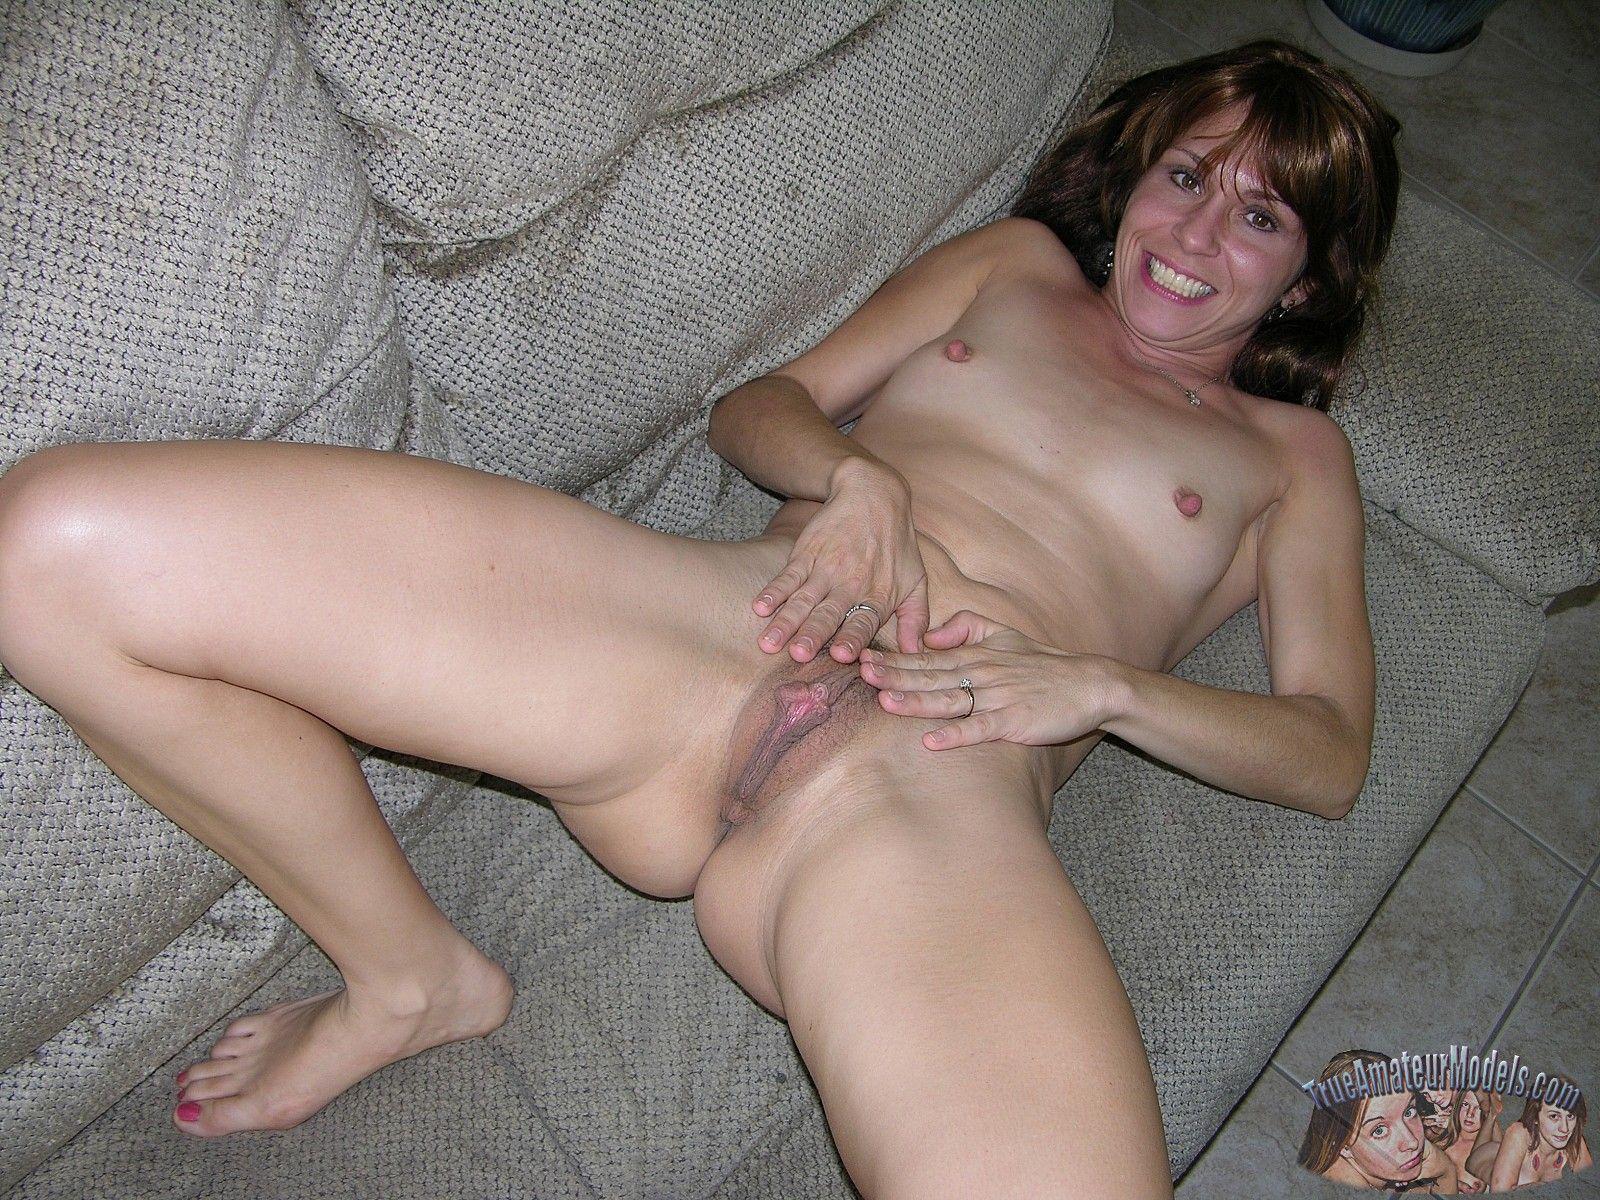 Old man gay sex pics